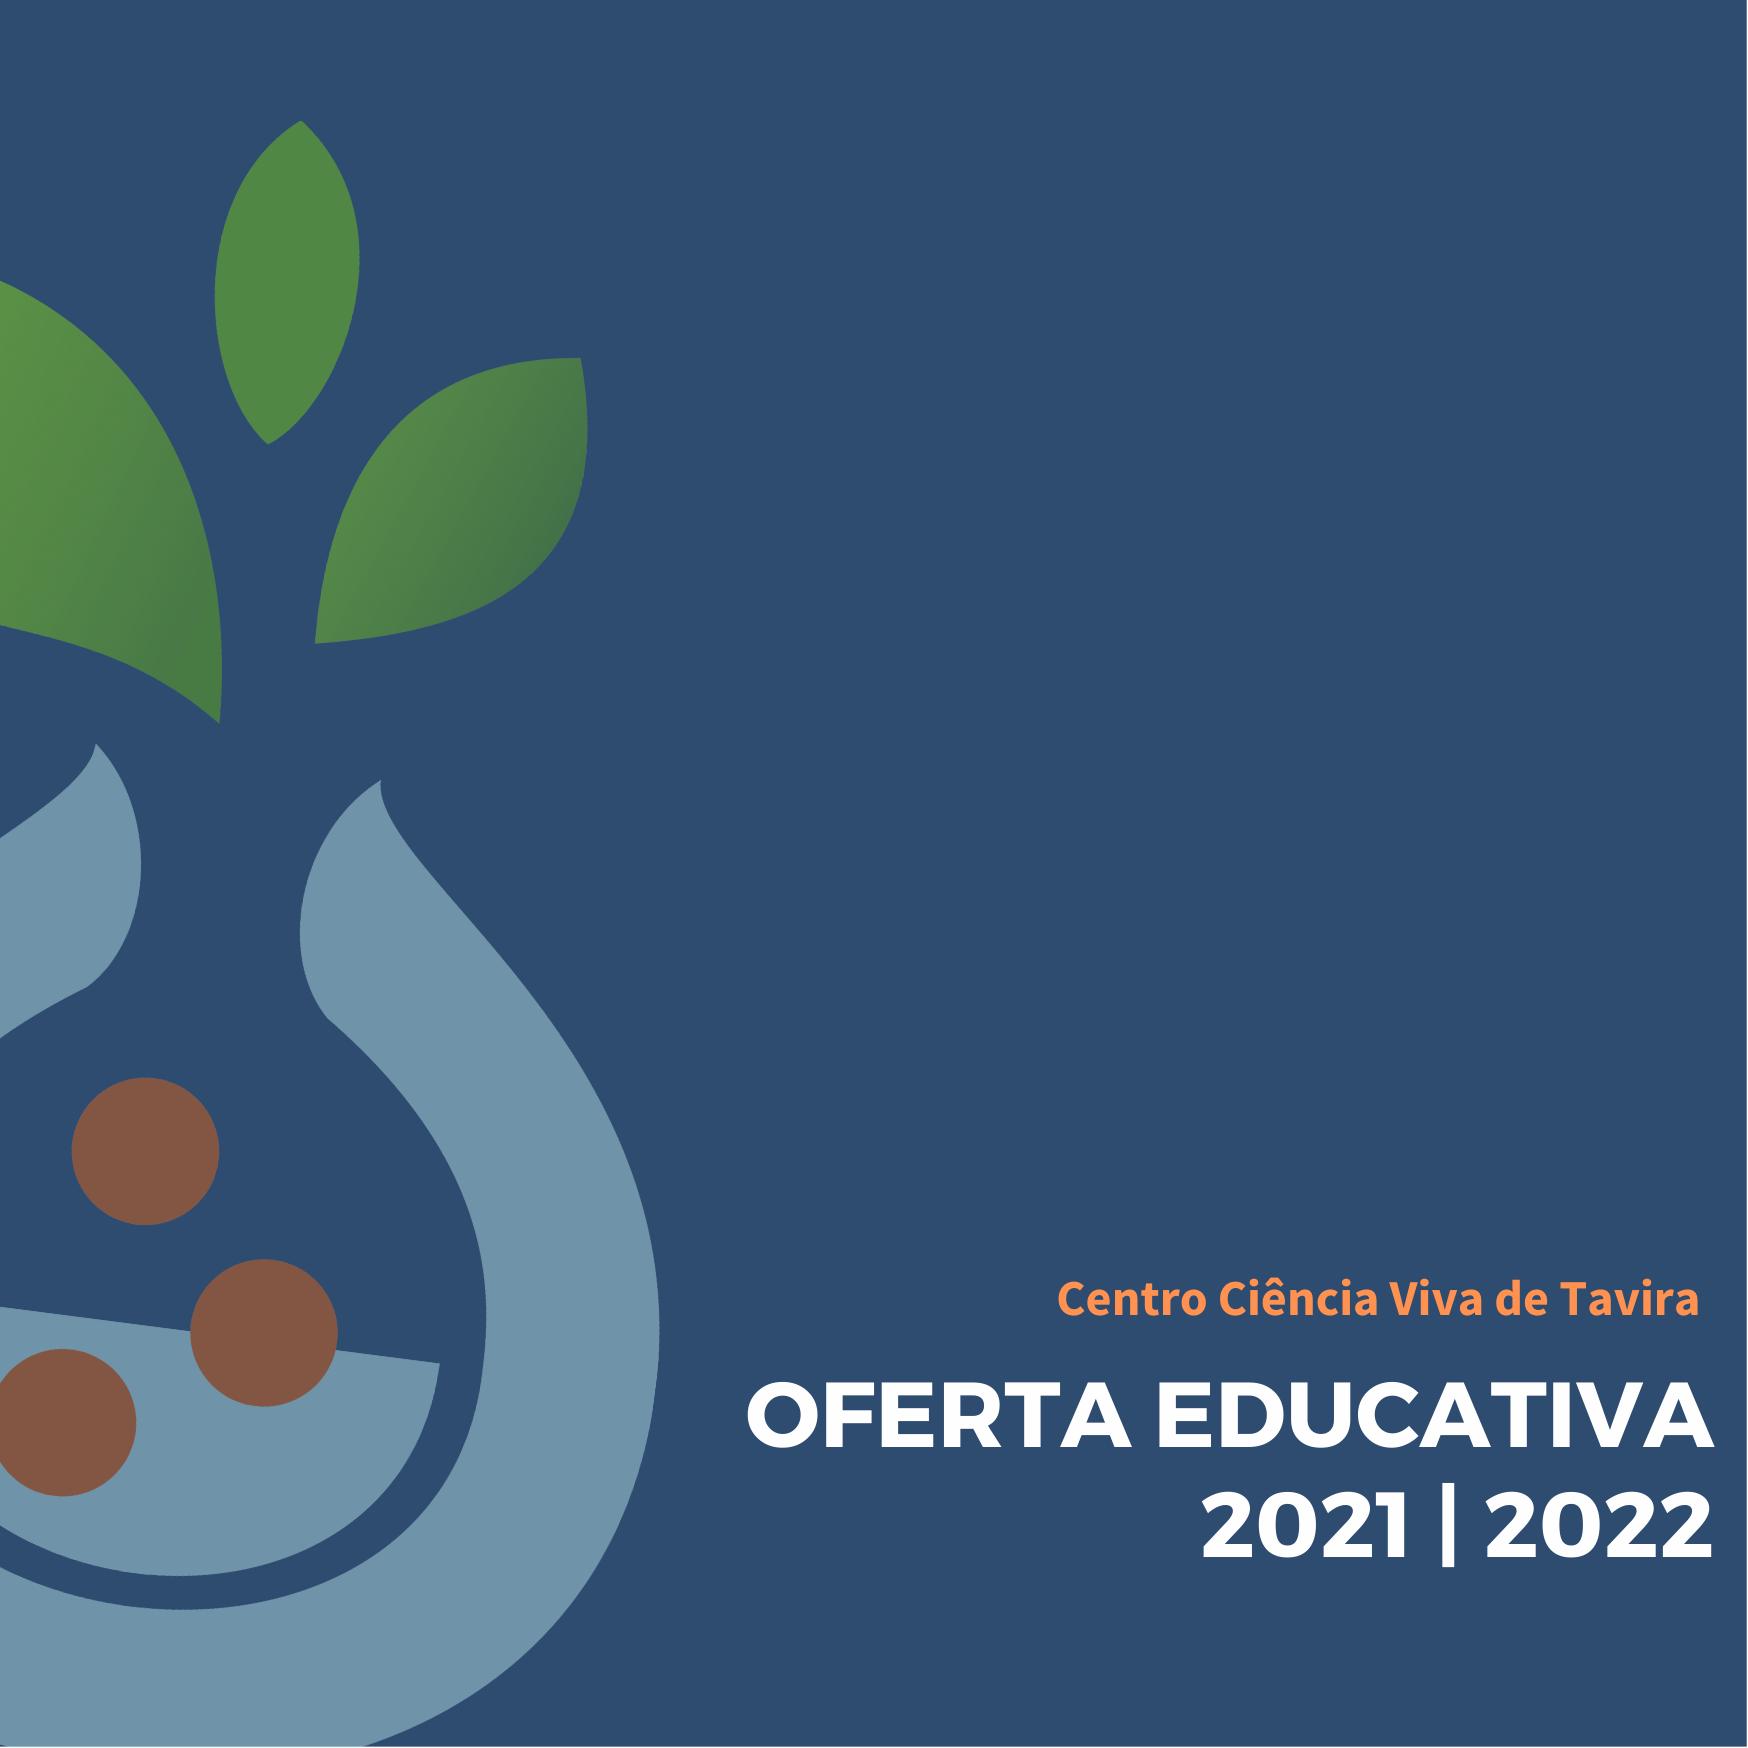 Oferta Educativa 2021/2022